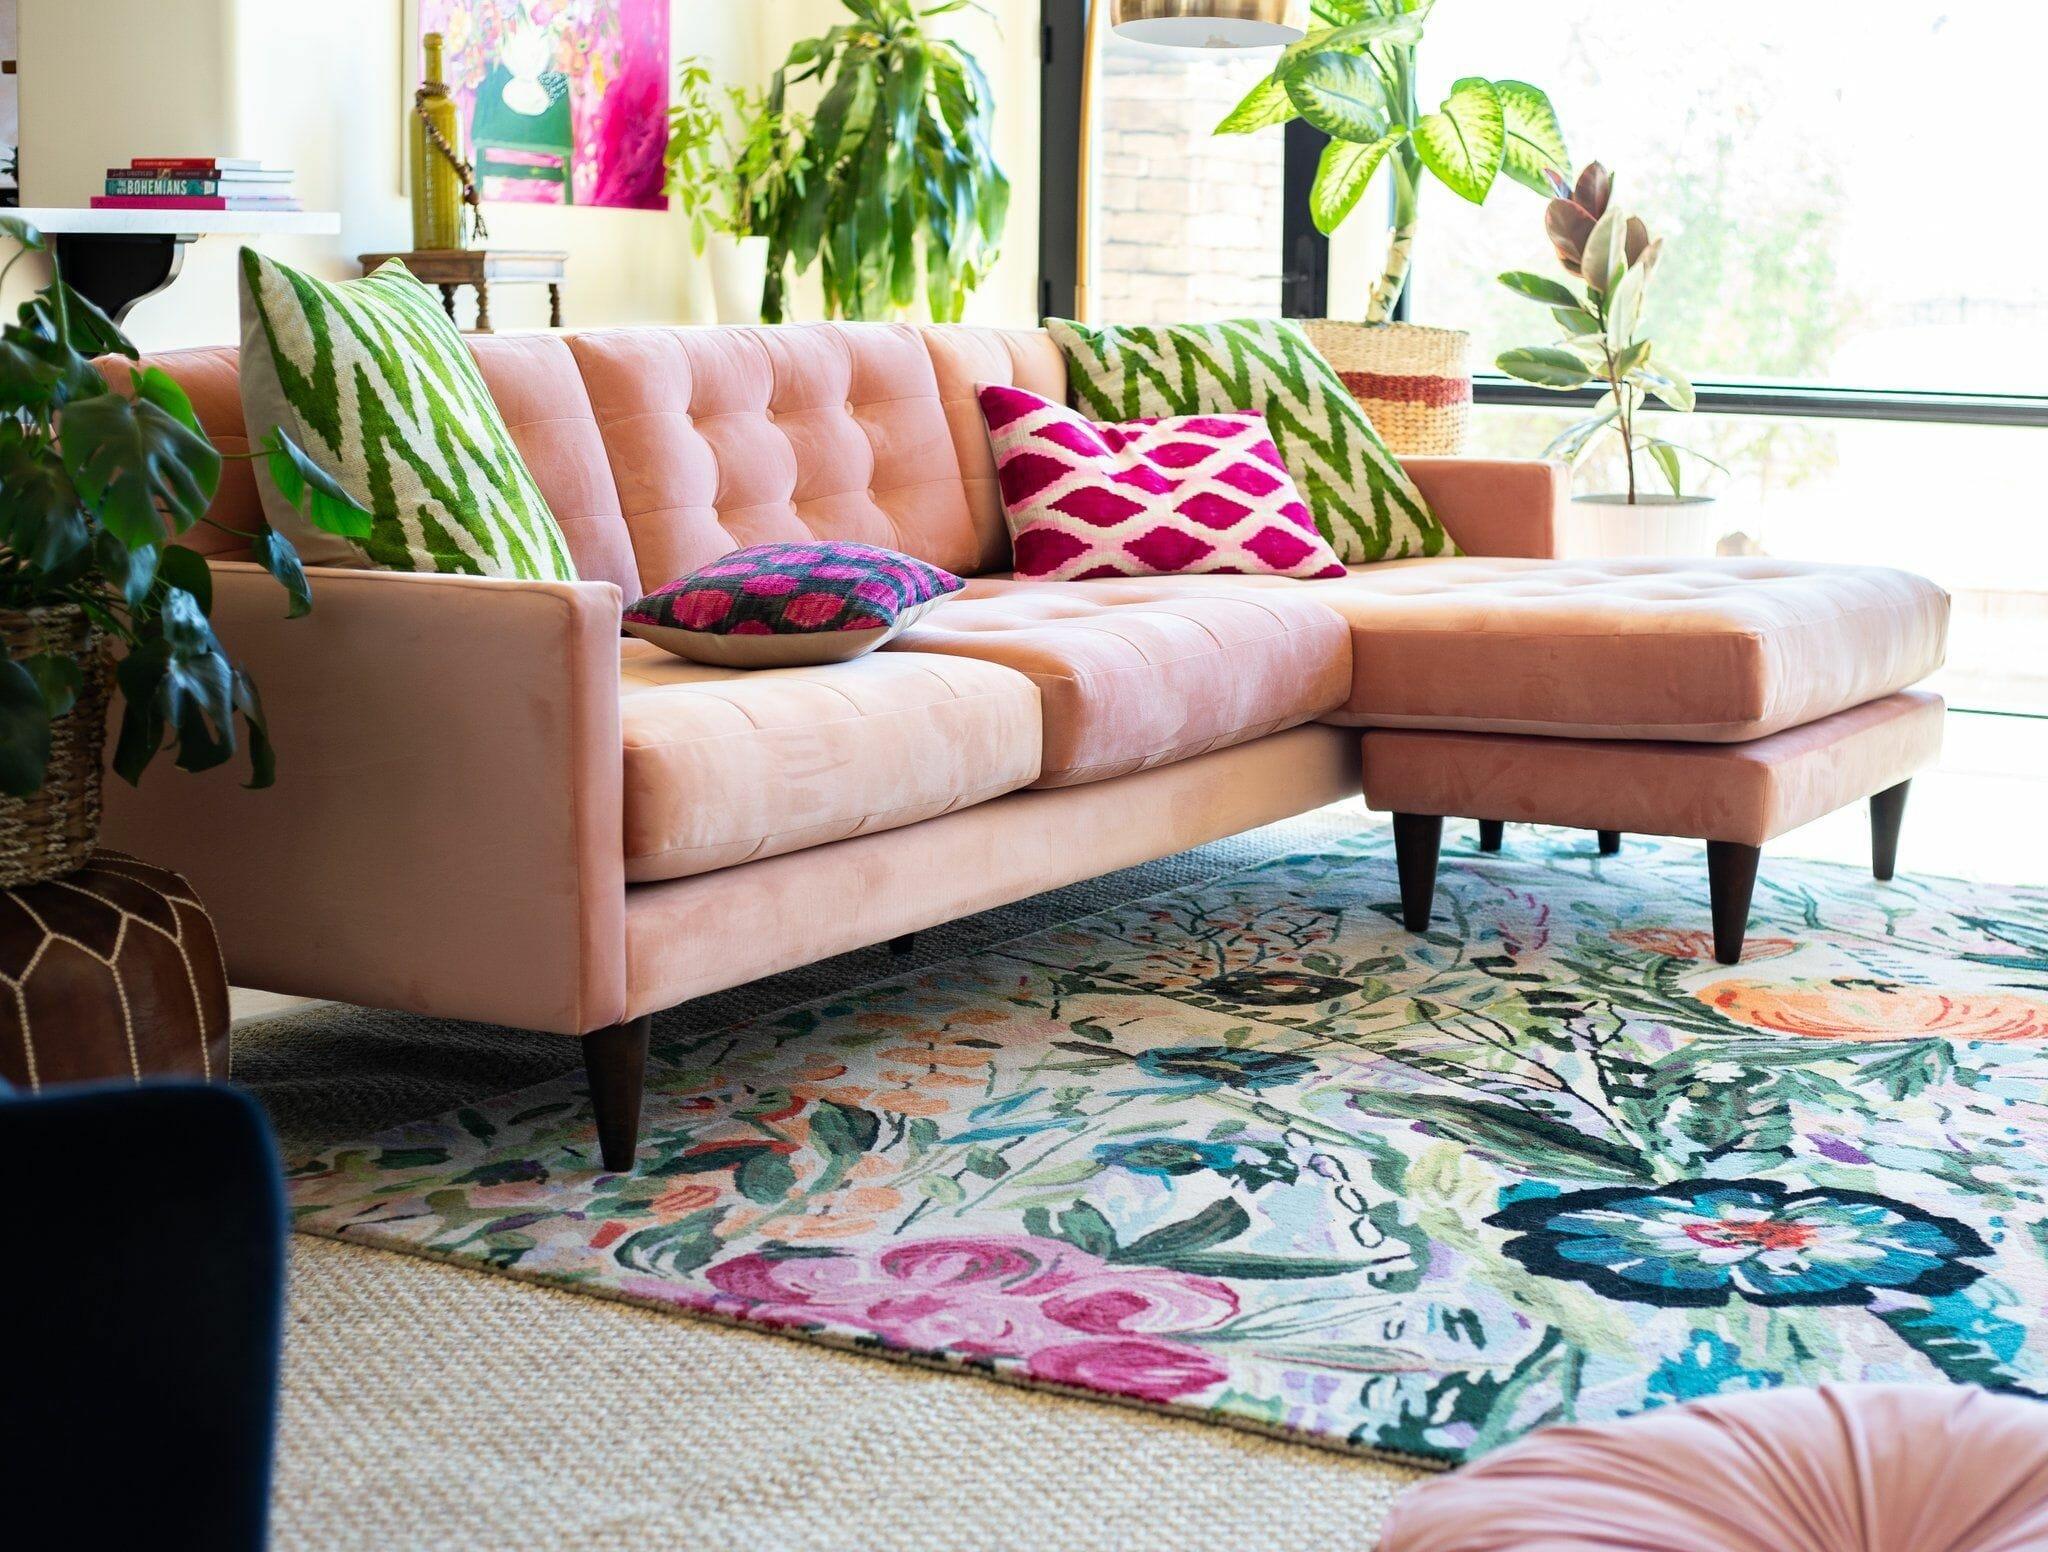 furniture store NYC - joybird